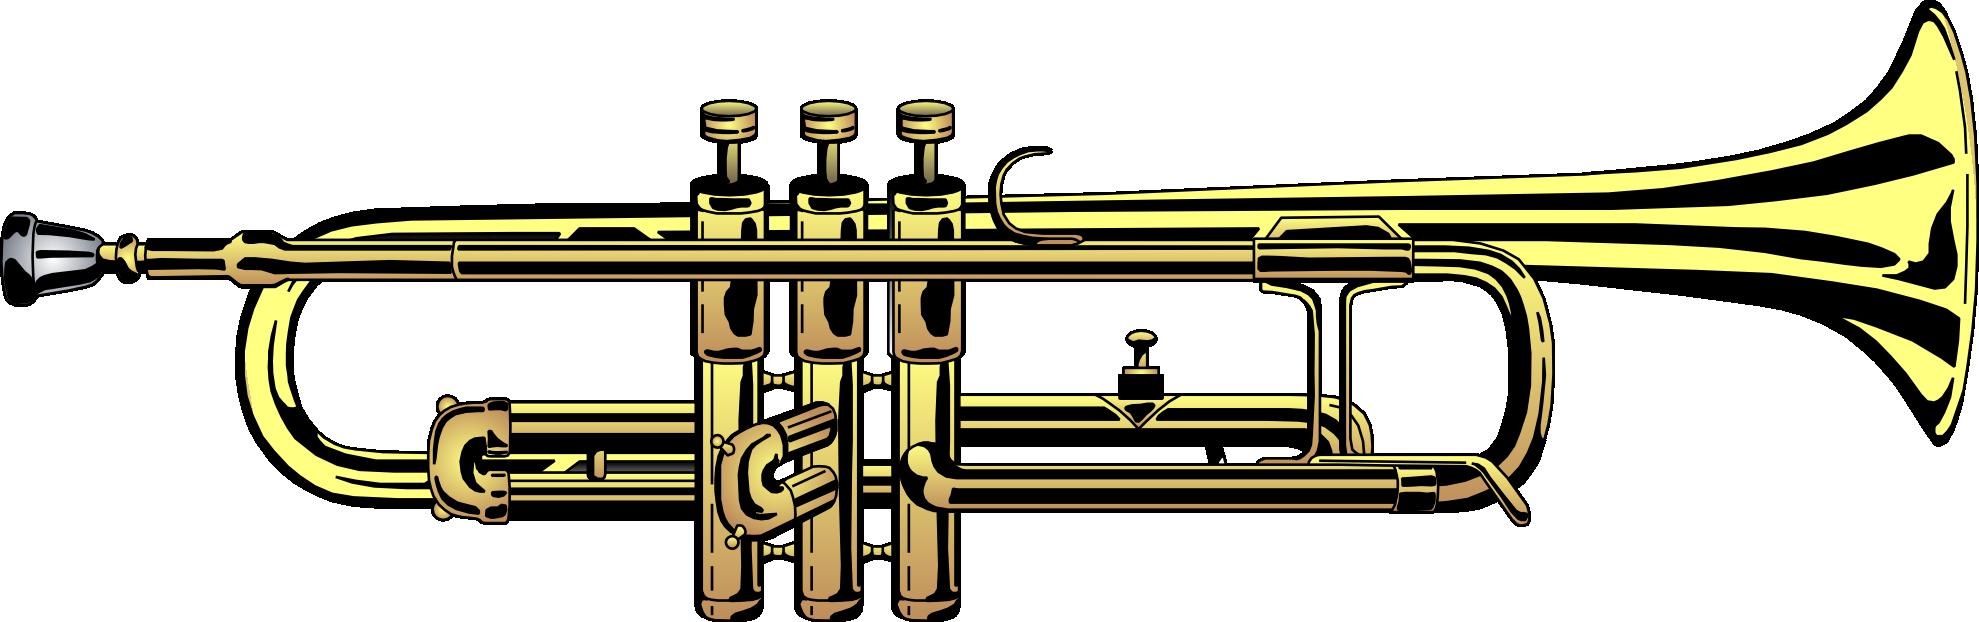 Trumpet Clipart & Trumpet Clip Art Images.